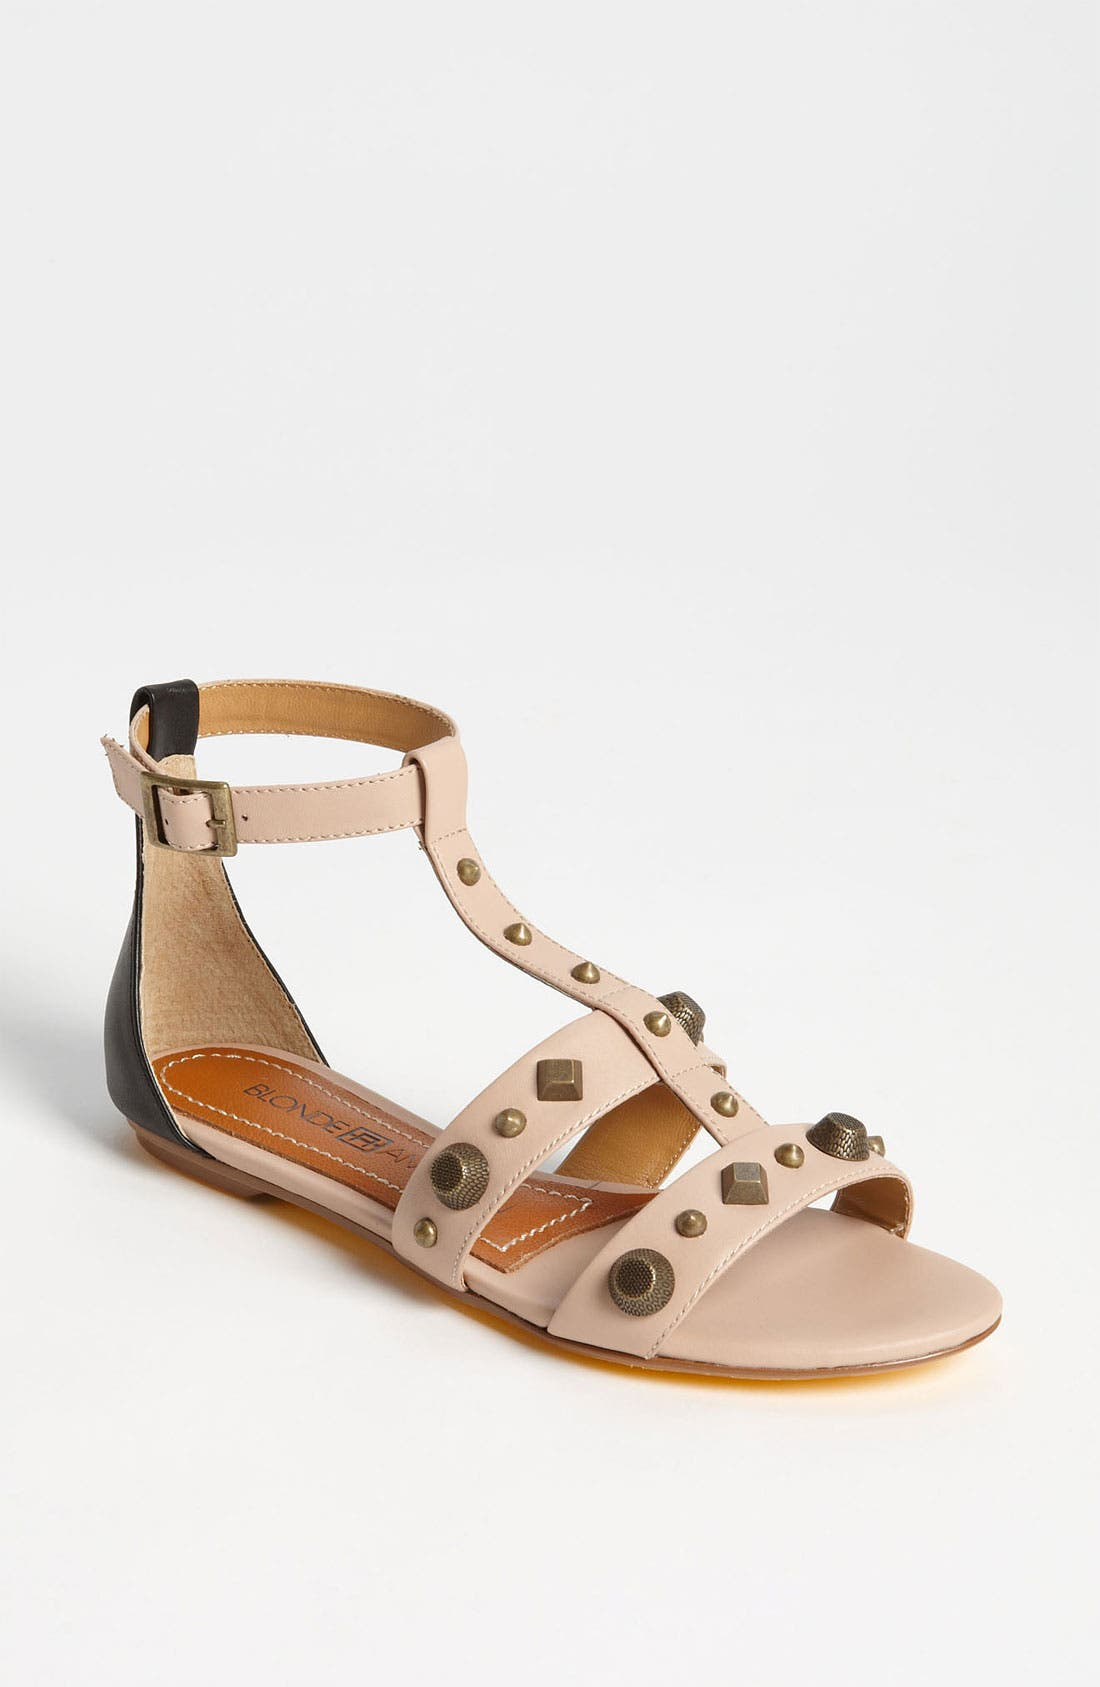 Alternate Image 1 Selected - Blonde Ambition 'Veracruz' Sandal